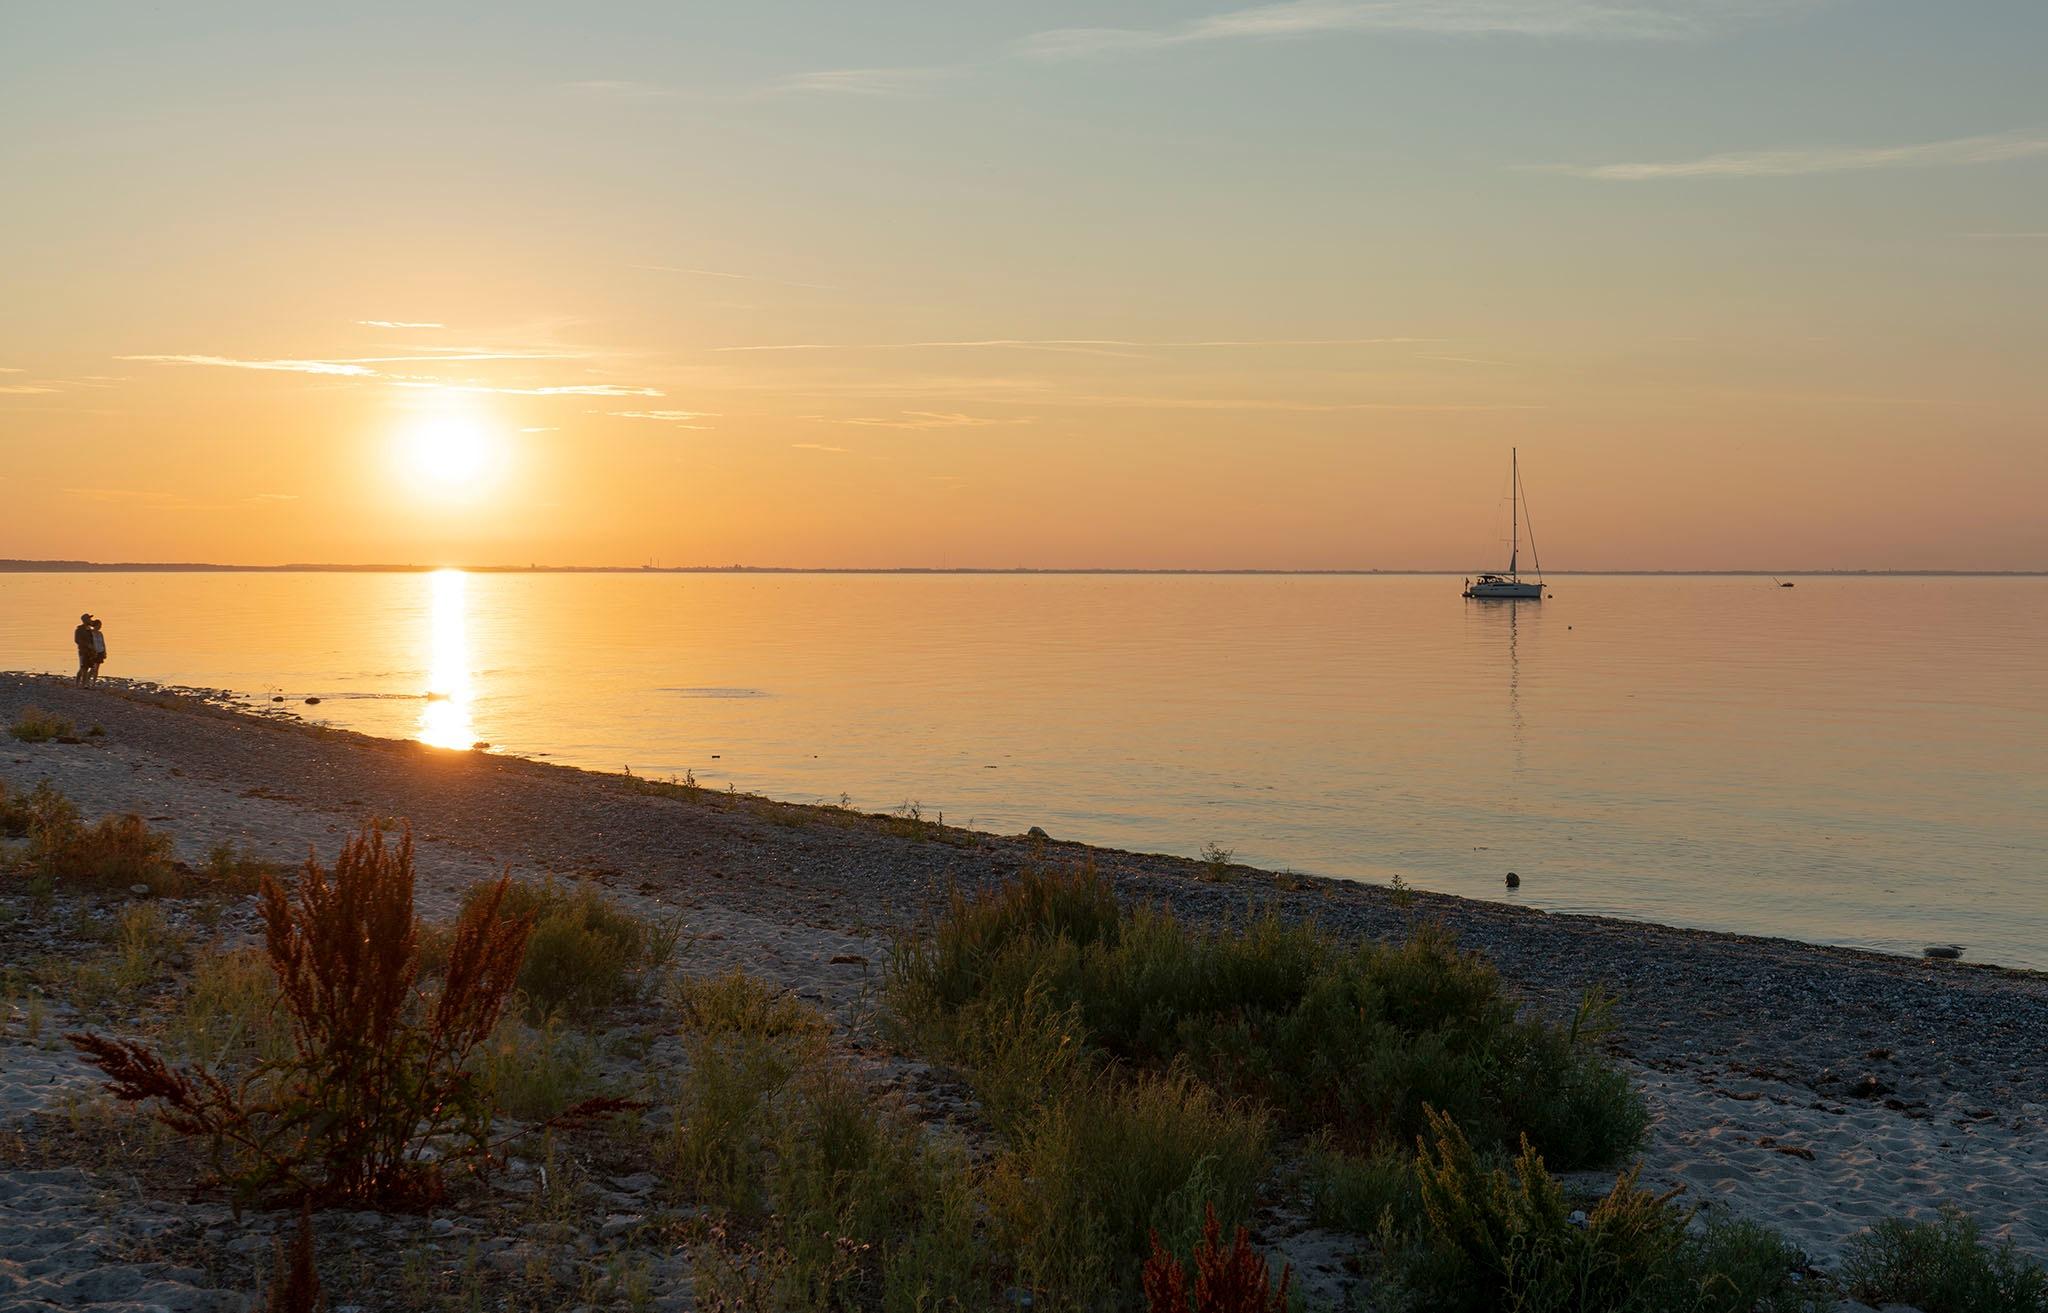 Summer evening by Dorte Hedengran